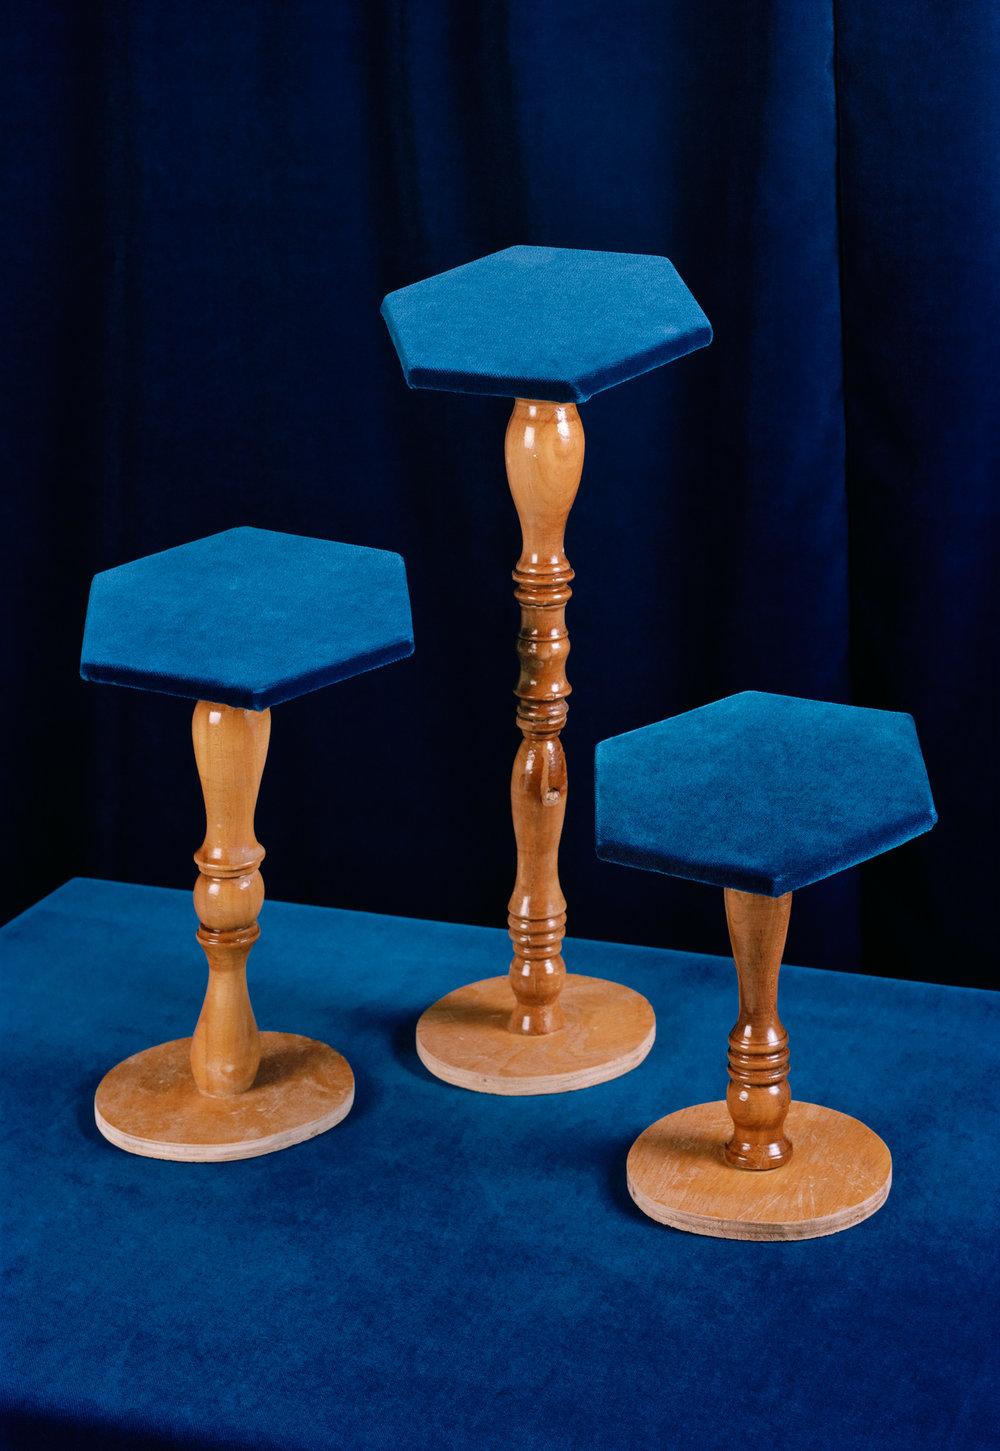 3 stools, 2016 C-Print, 146 x 100 cm